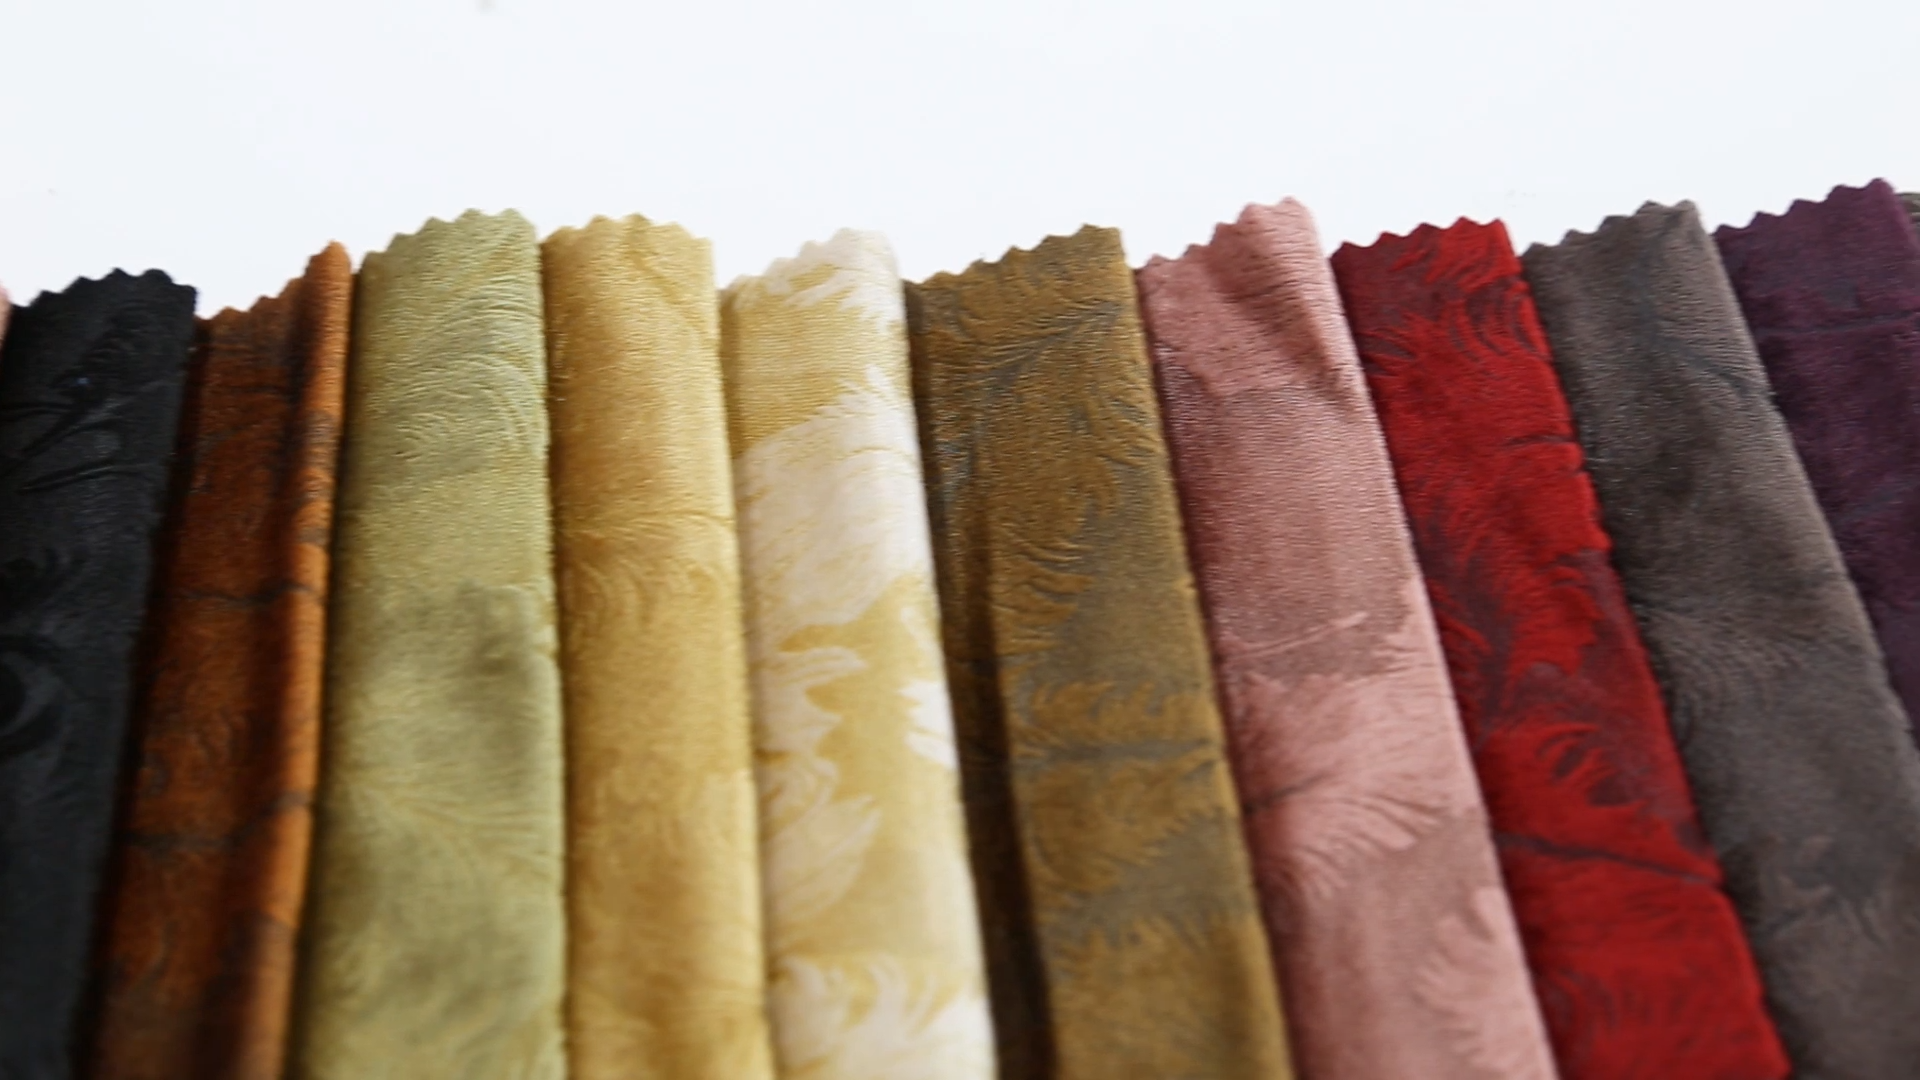 Sofa material fabric upholstery polyester sofa fabric